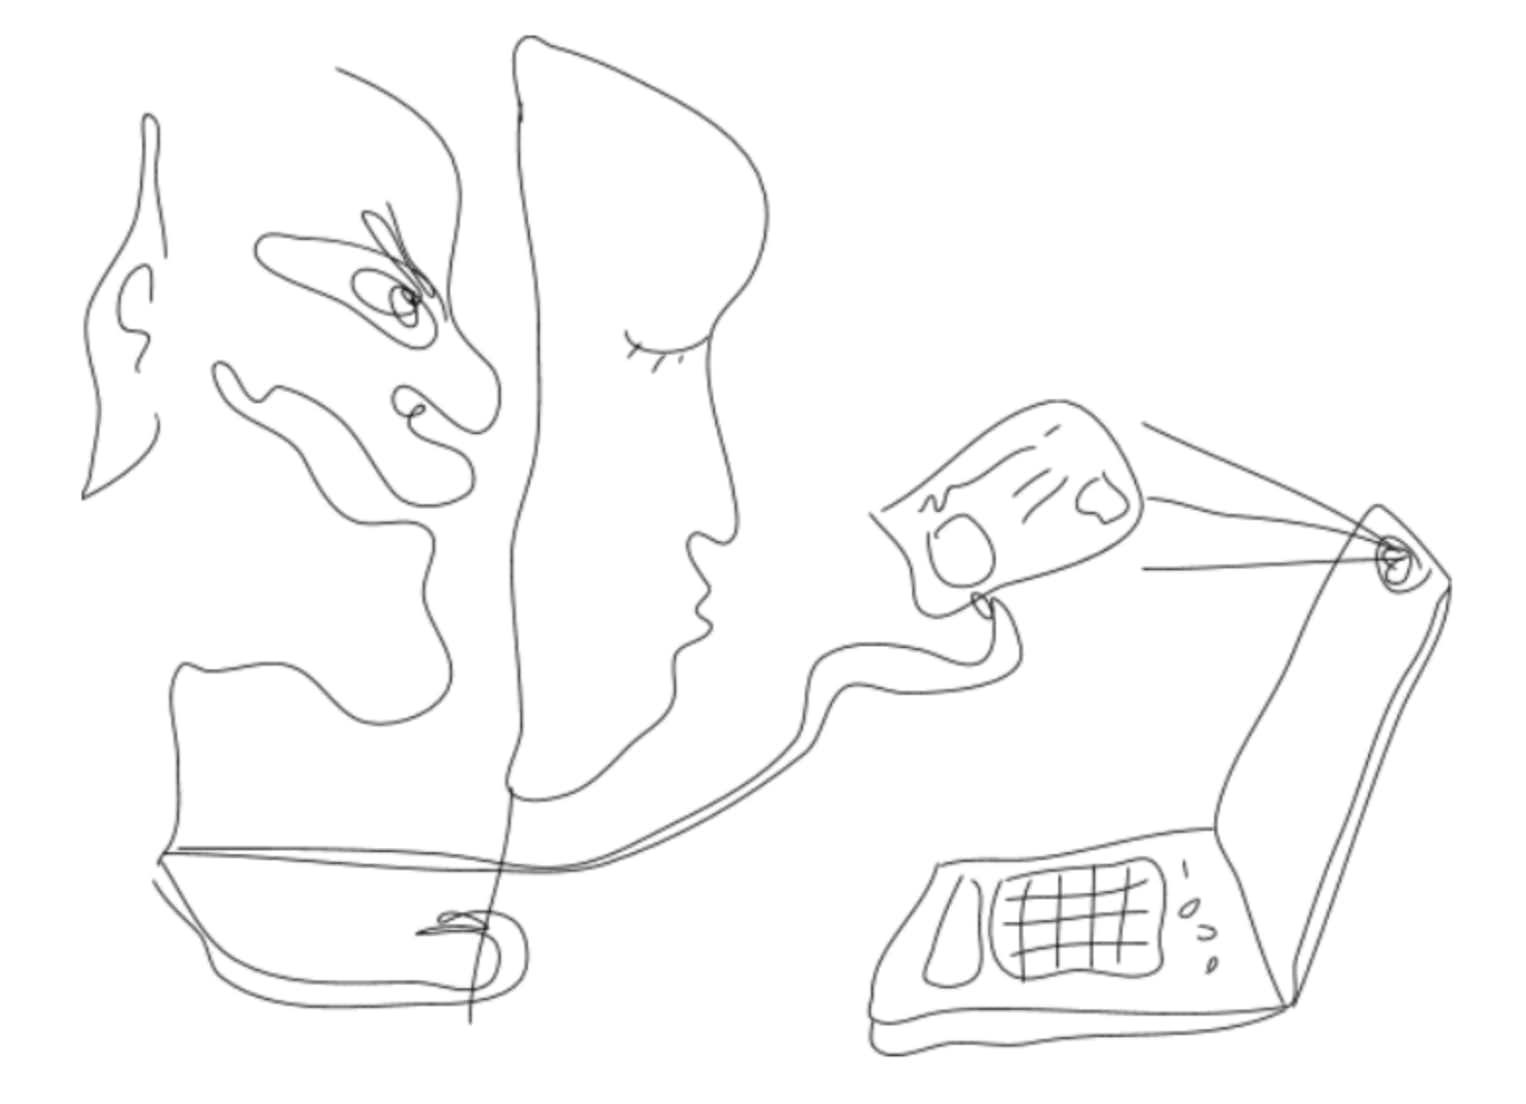 Online identity fraud illustration